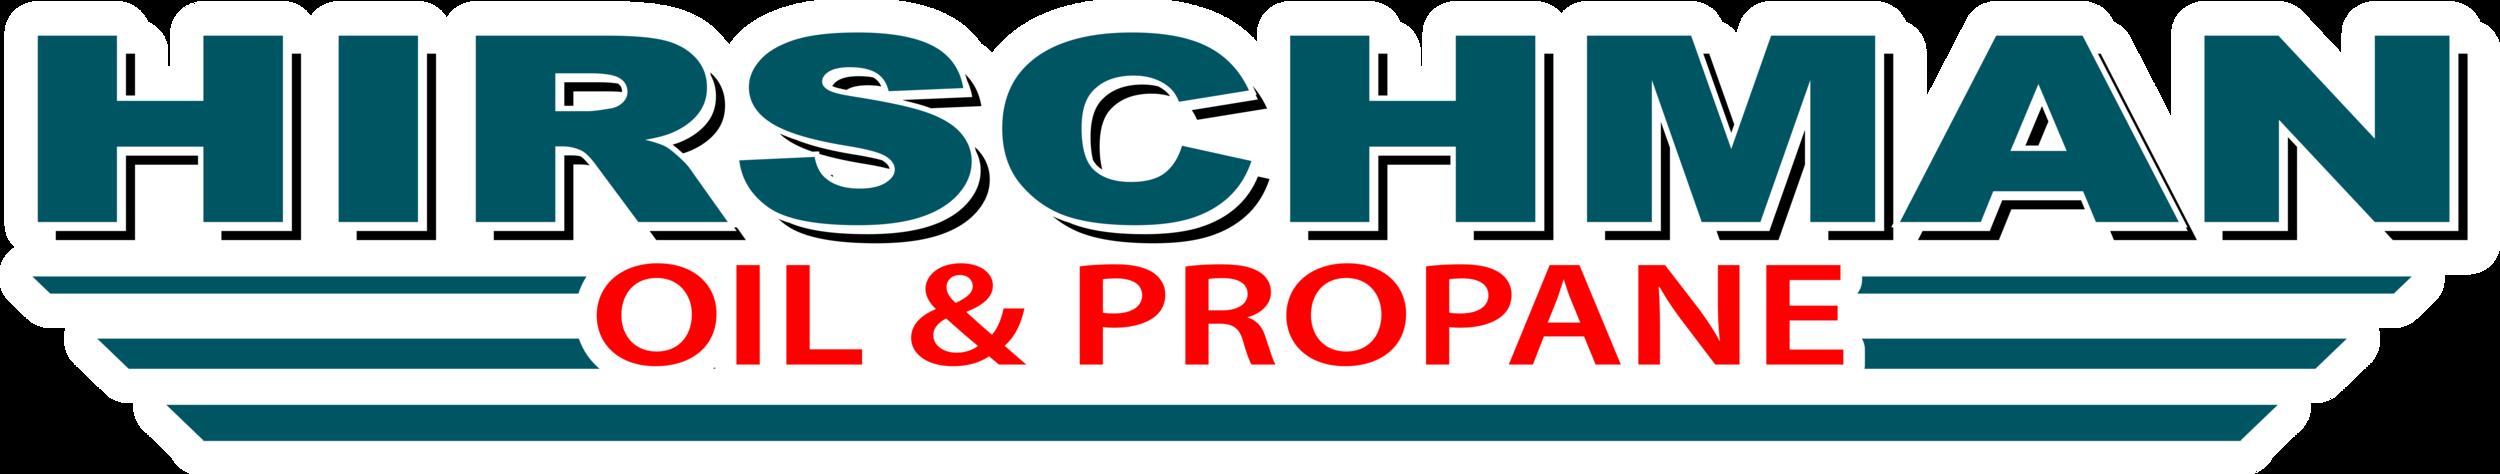 Hirschman logo.png